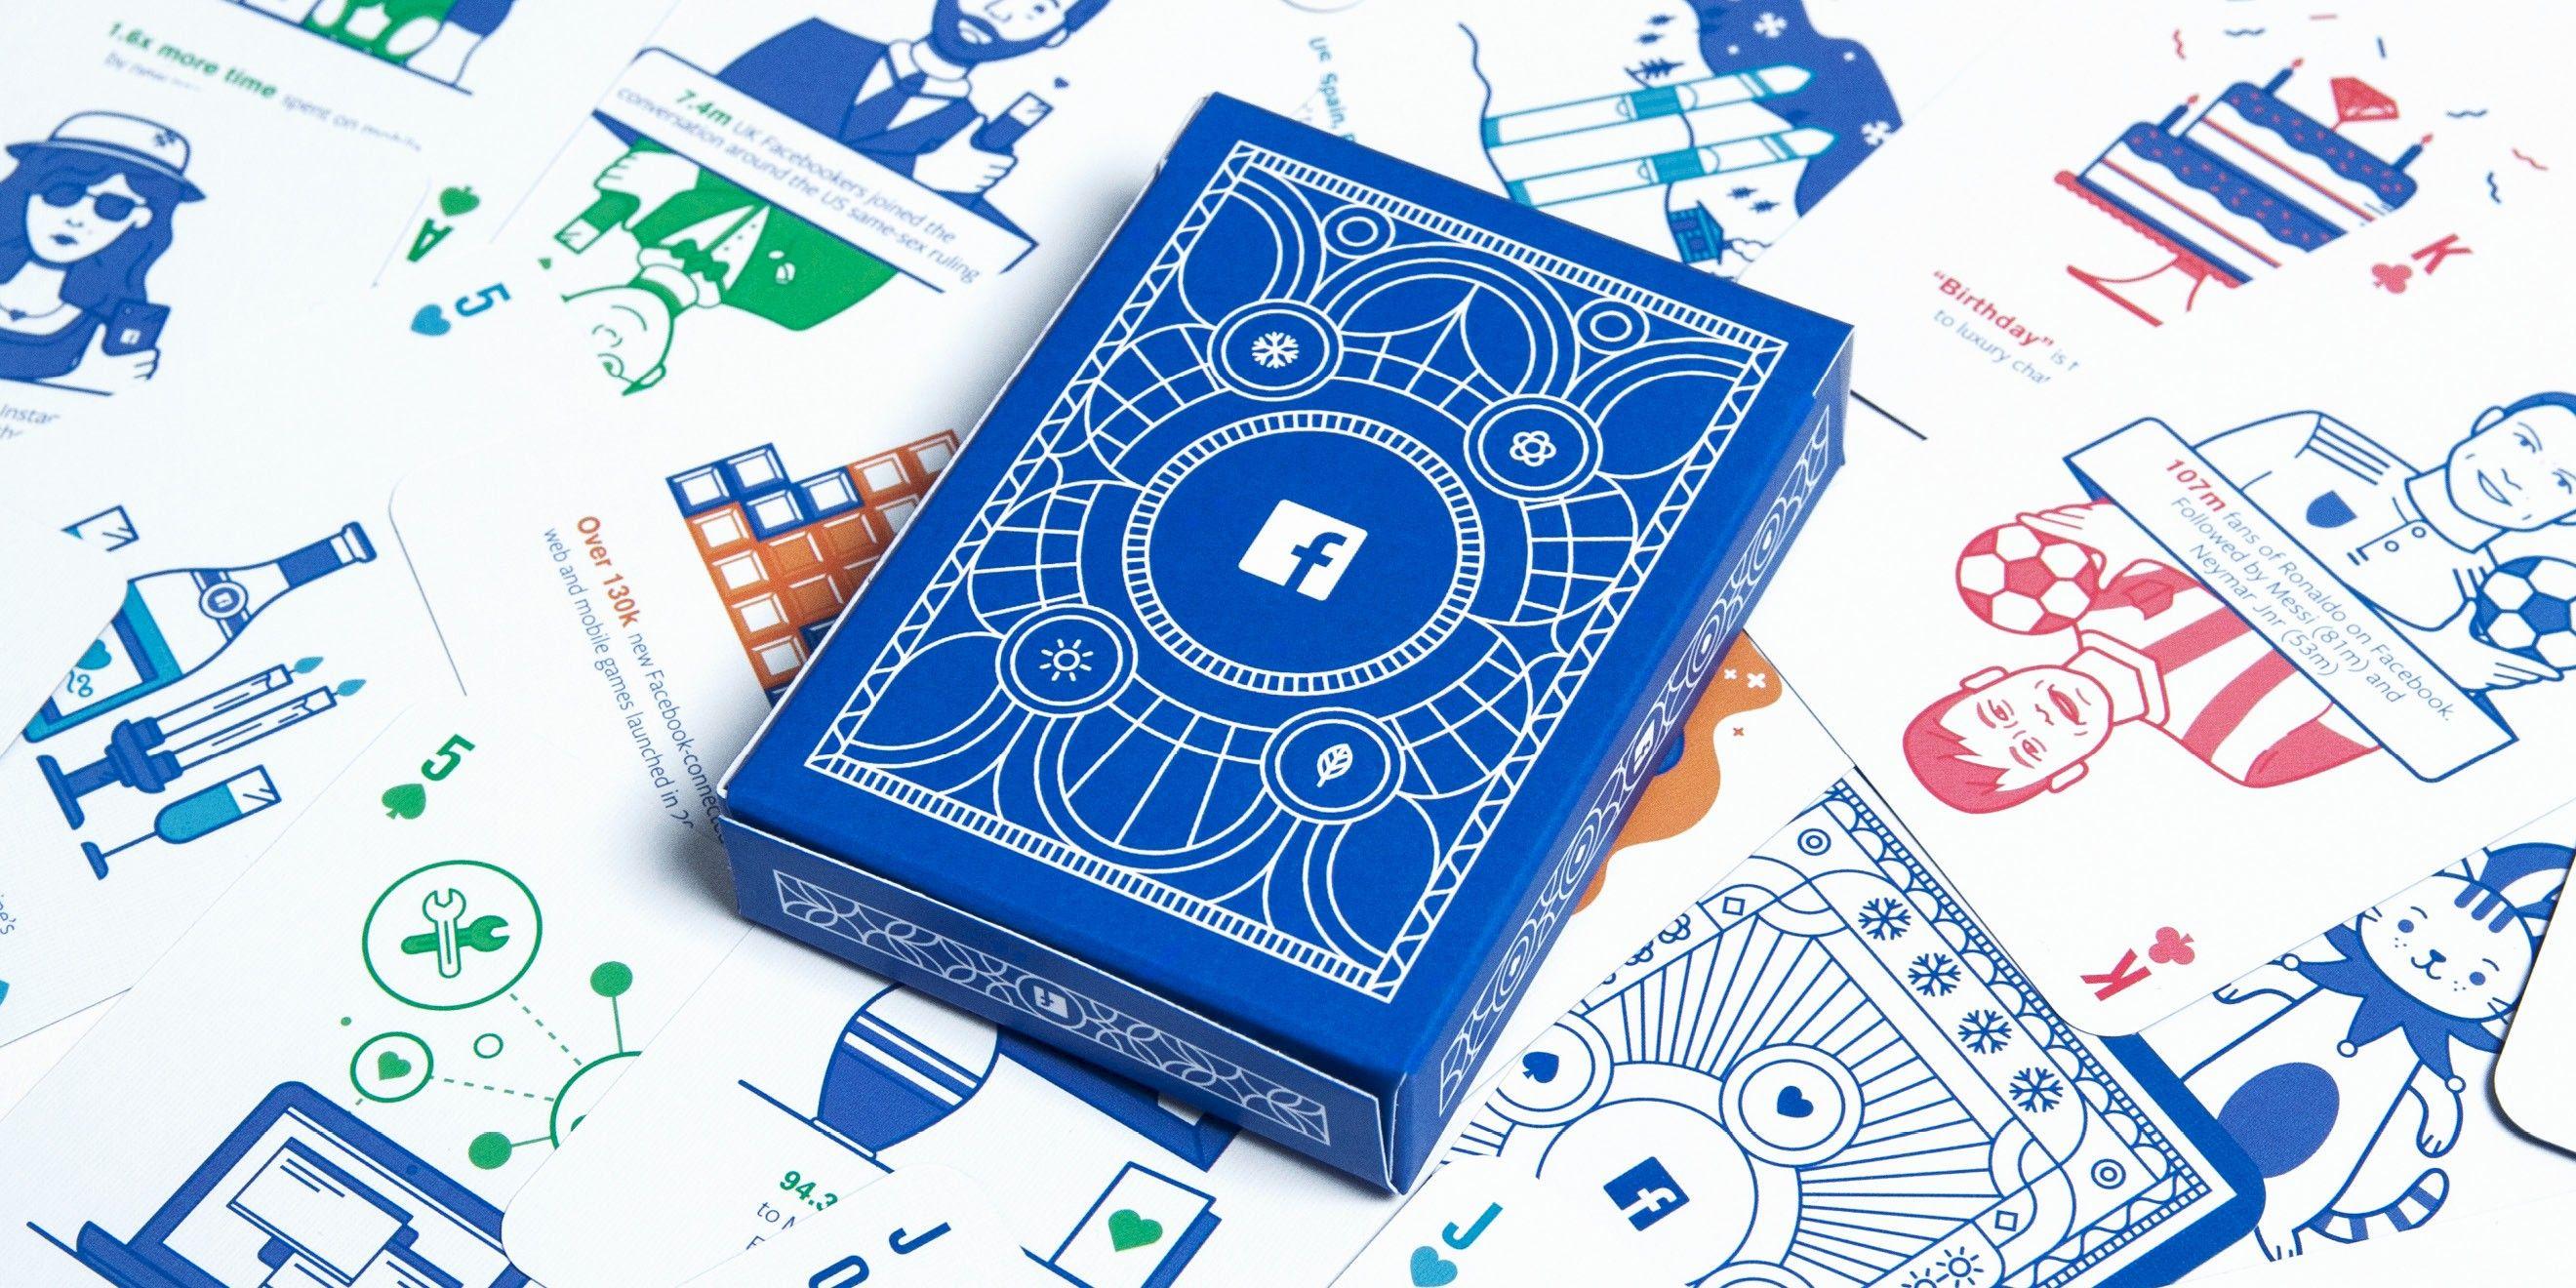 Baraja de cartas Facebook